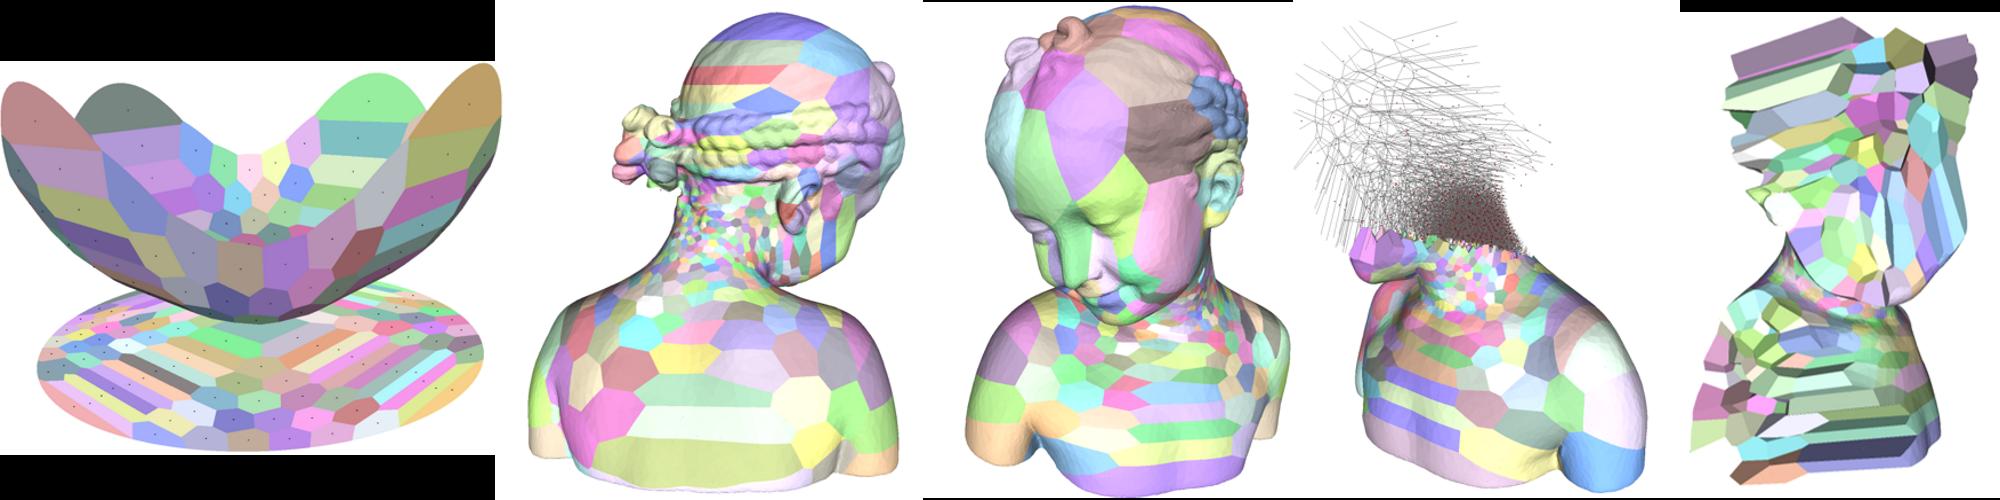 Optimal weighted Voronoi tessellations